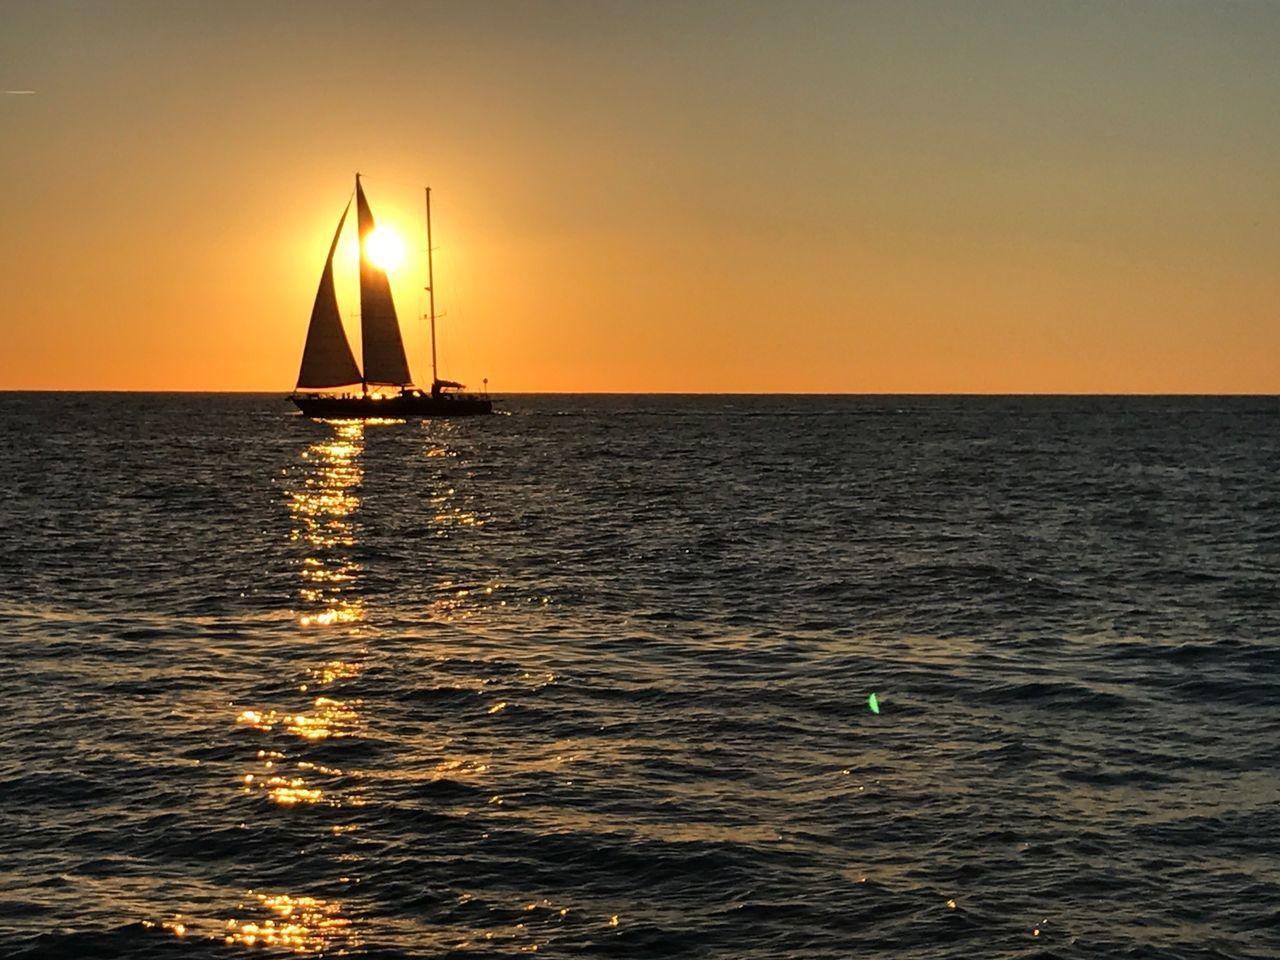 Sunset 1 Sunset Sea Nautical Vessel Water Transportation Horizon Over Water Sailing Sailboat Nature Sun Outdoors No People Sky Yacht Regatta Day